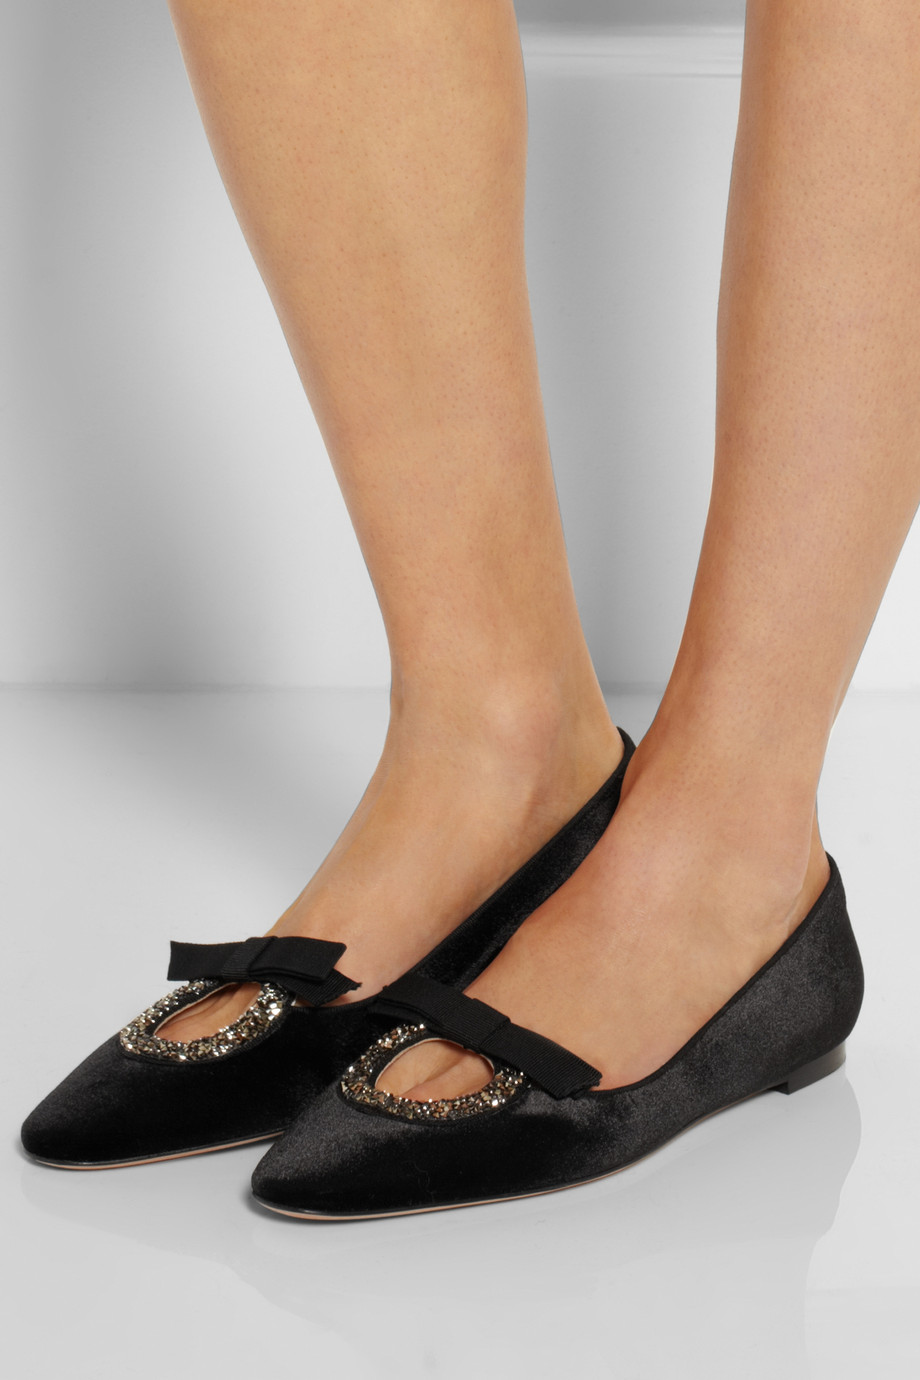 0c61b379f51 Lyst - Valentino Crystal-Embellished Velvet Ballet Flats in Black